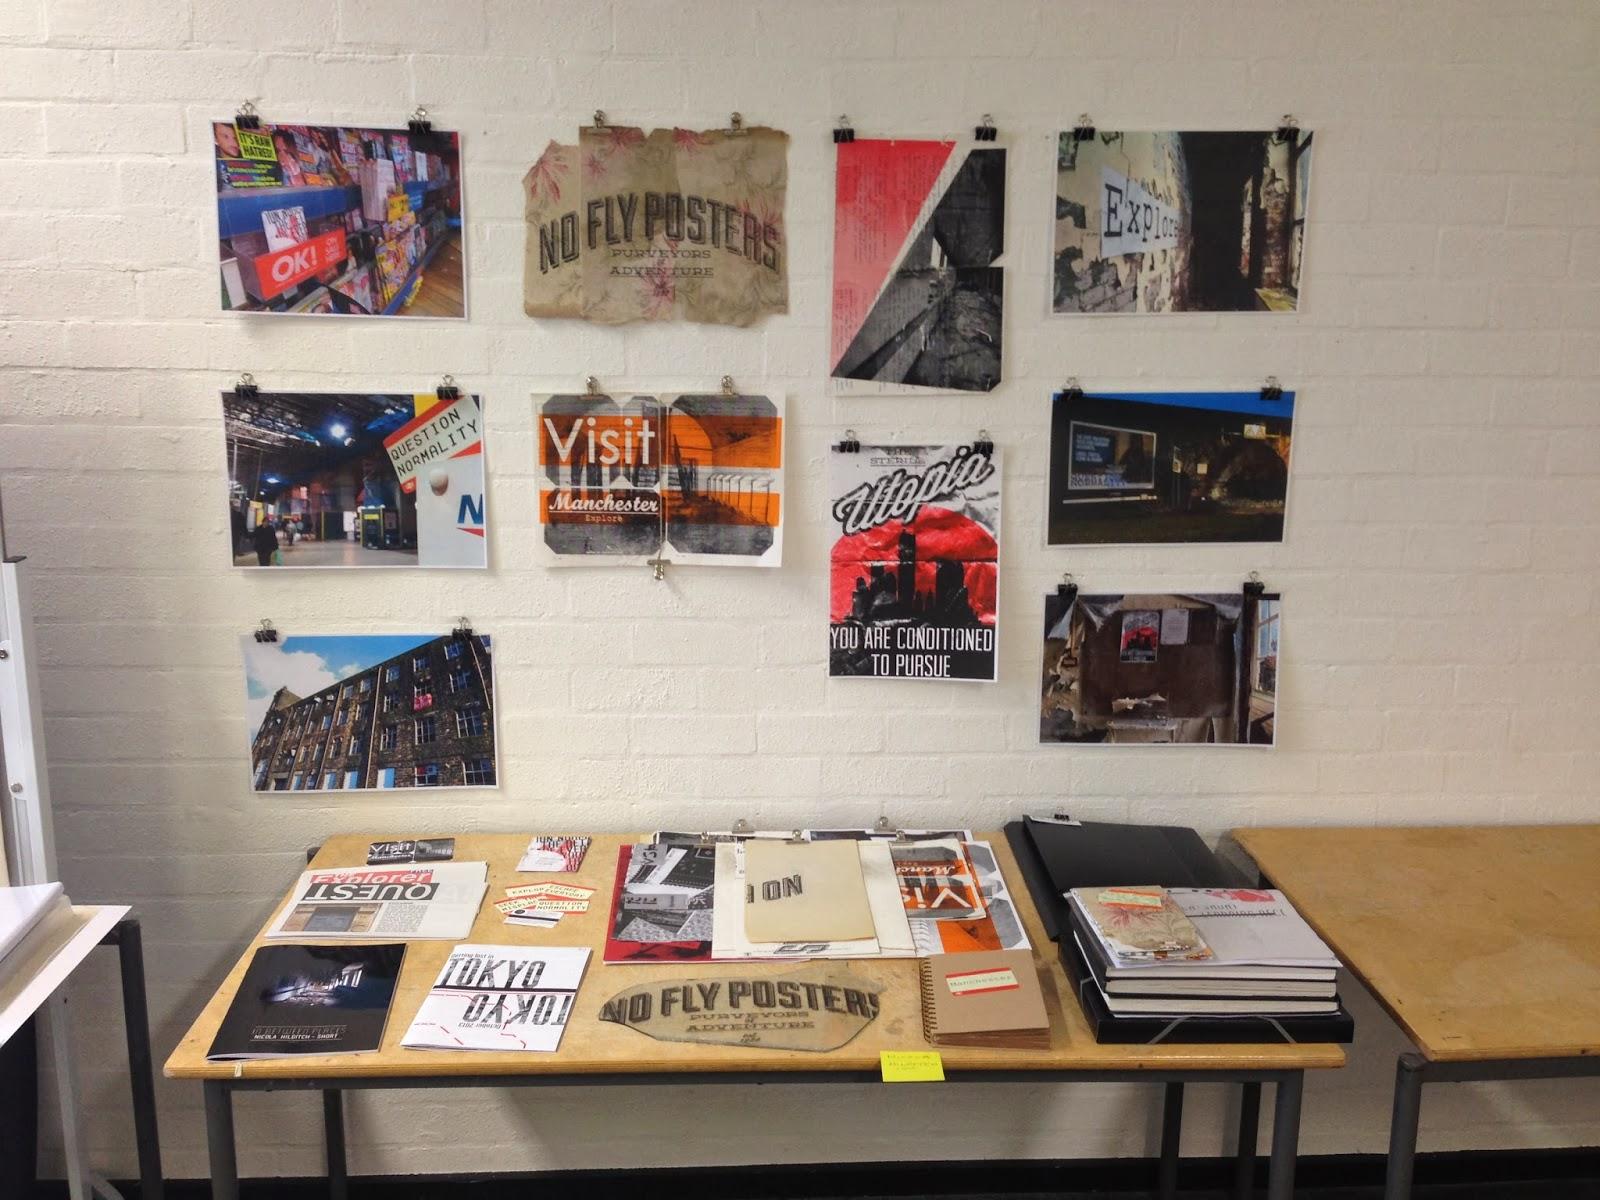 Design and Art Direction, D&AD, Graphic Design, Fine Art, MMU, Manchester school of art,